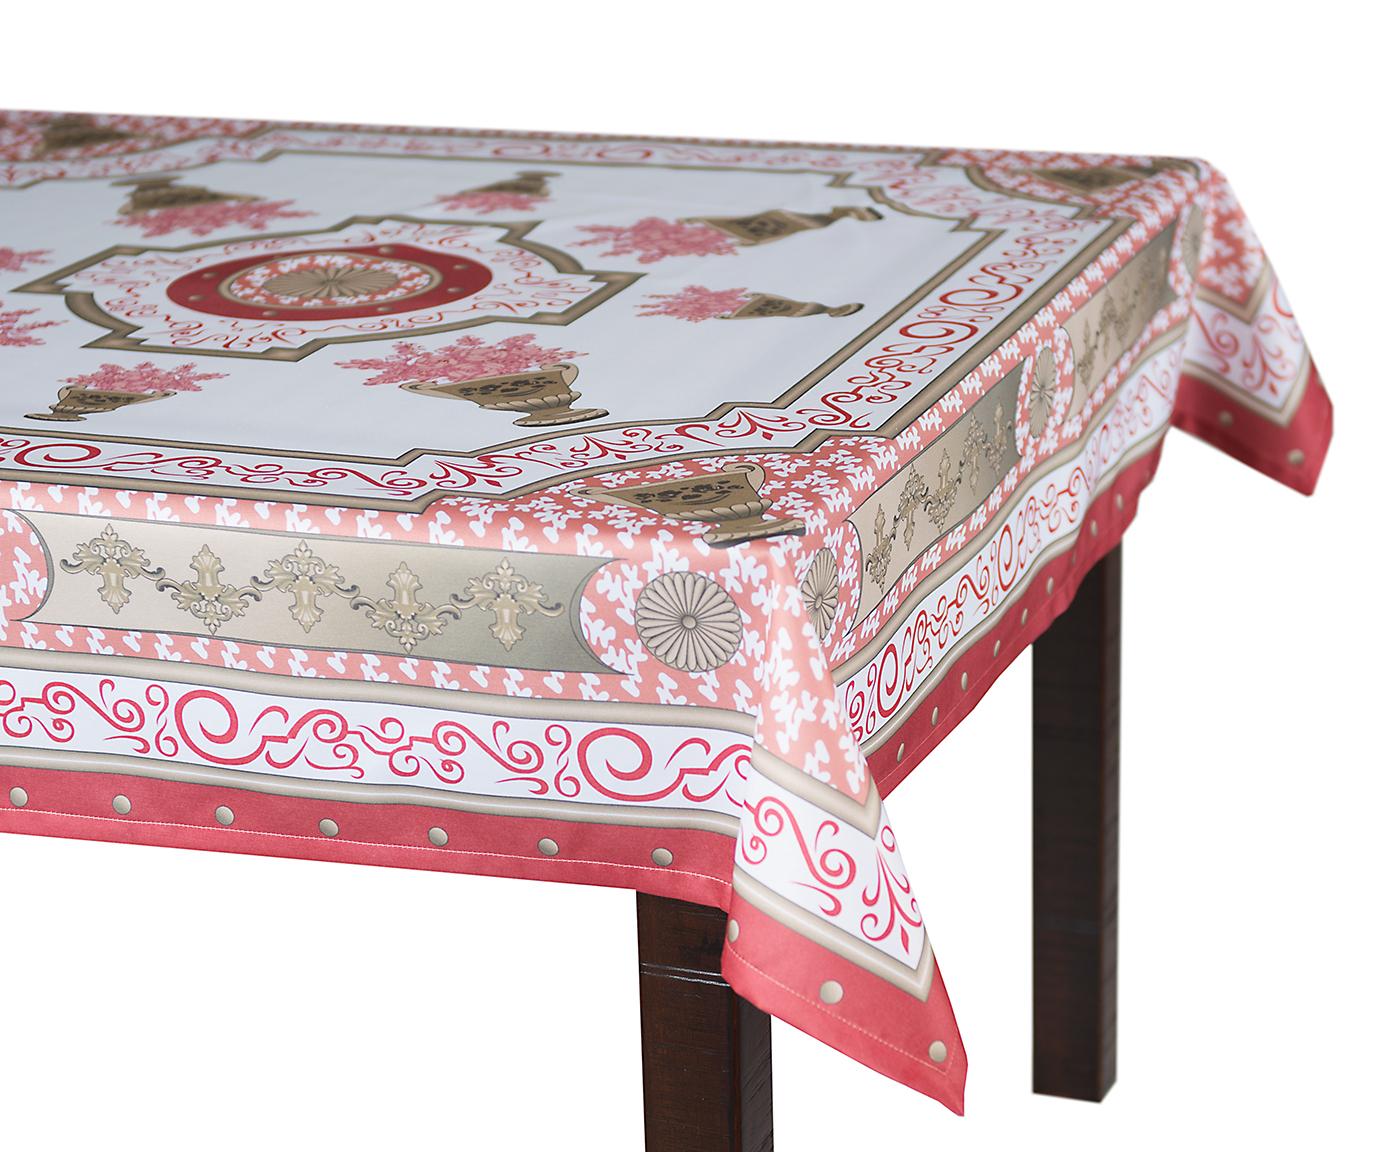 Кухня Скатерть 140x180 Blonder Home Rosetta розовая skatert-140x180-blonder-home-rosetta-rozovaya-ssha-rossiya.jpg